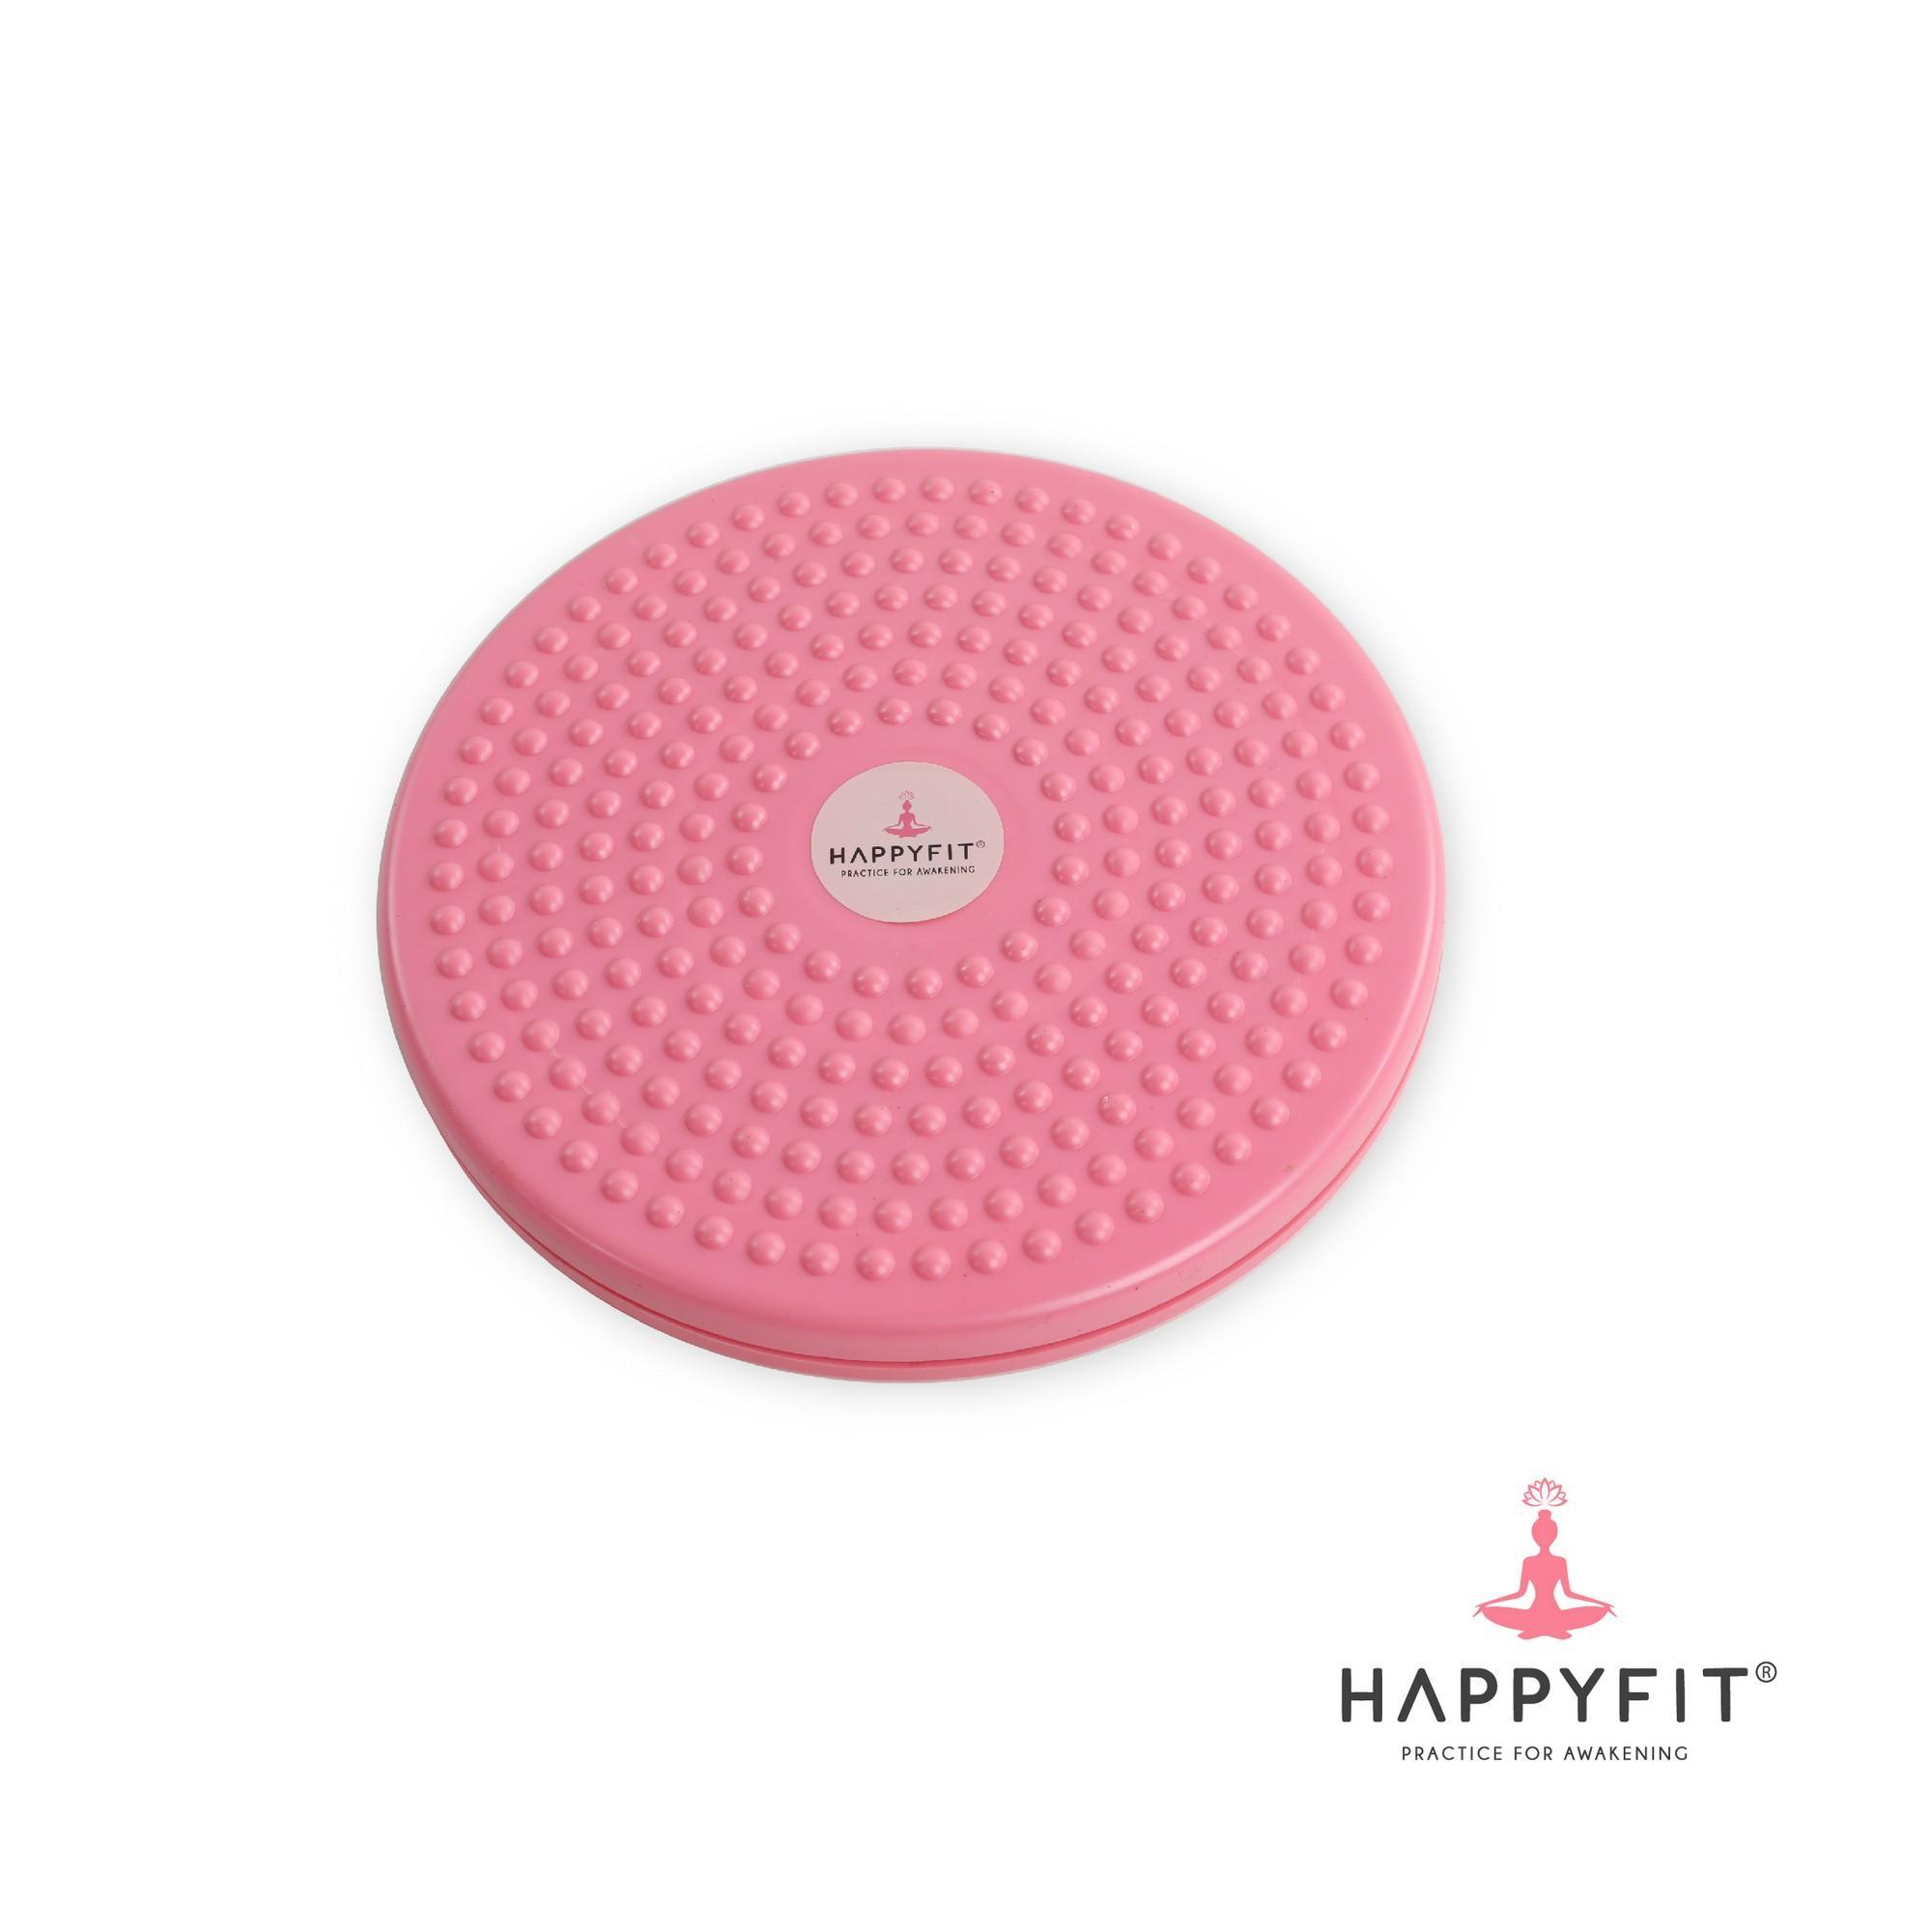 Happyfit Figure Trimmer - Pink By Happyfit Indonesia